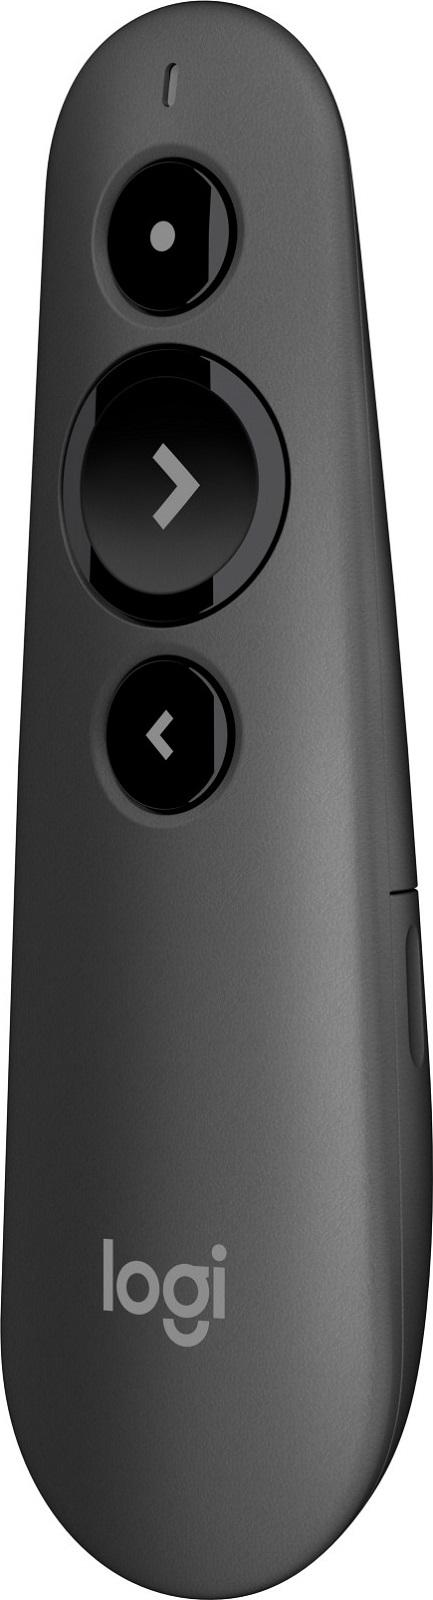 цена на Презентер (910-005386) Logitech Wireless Presenter R500 GRAPHITE